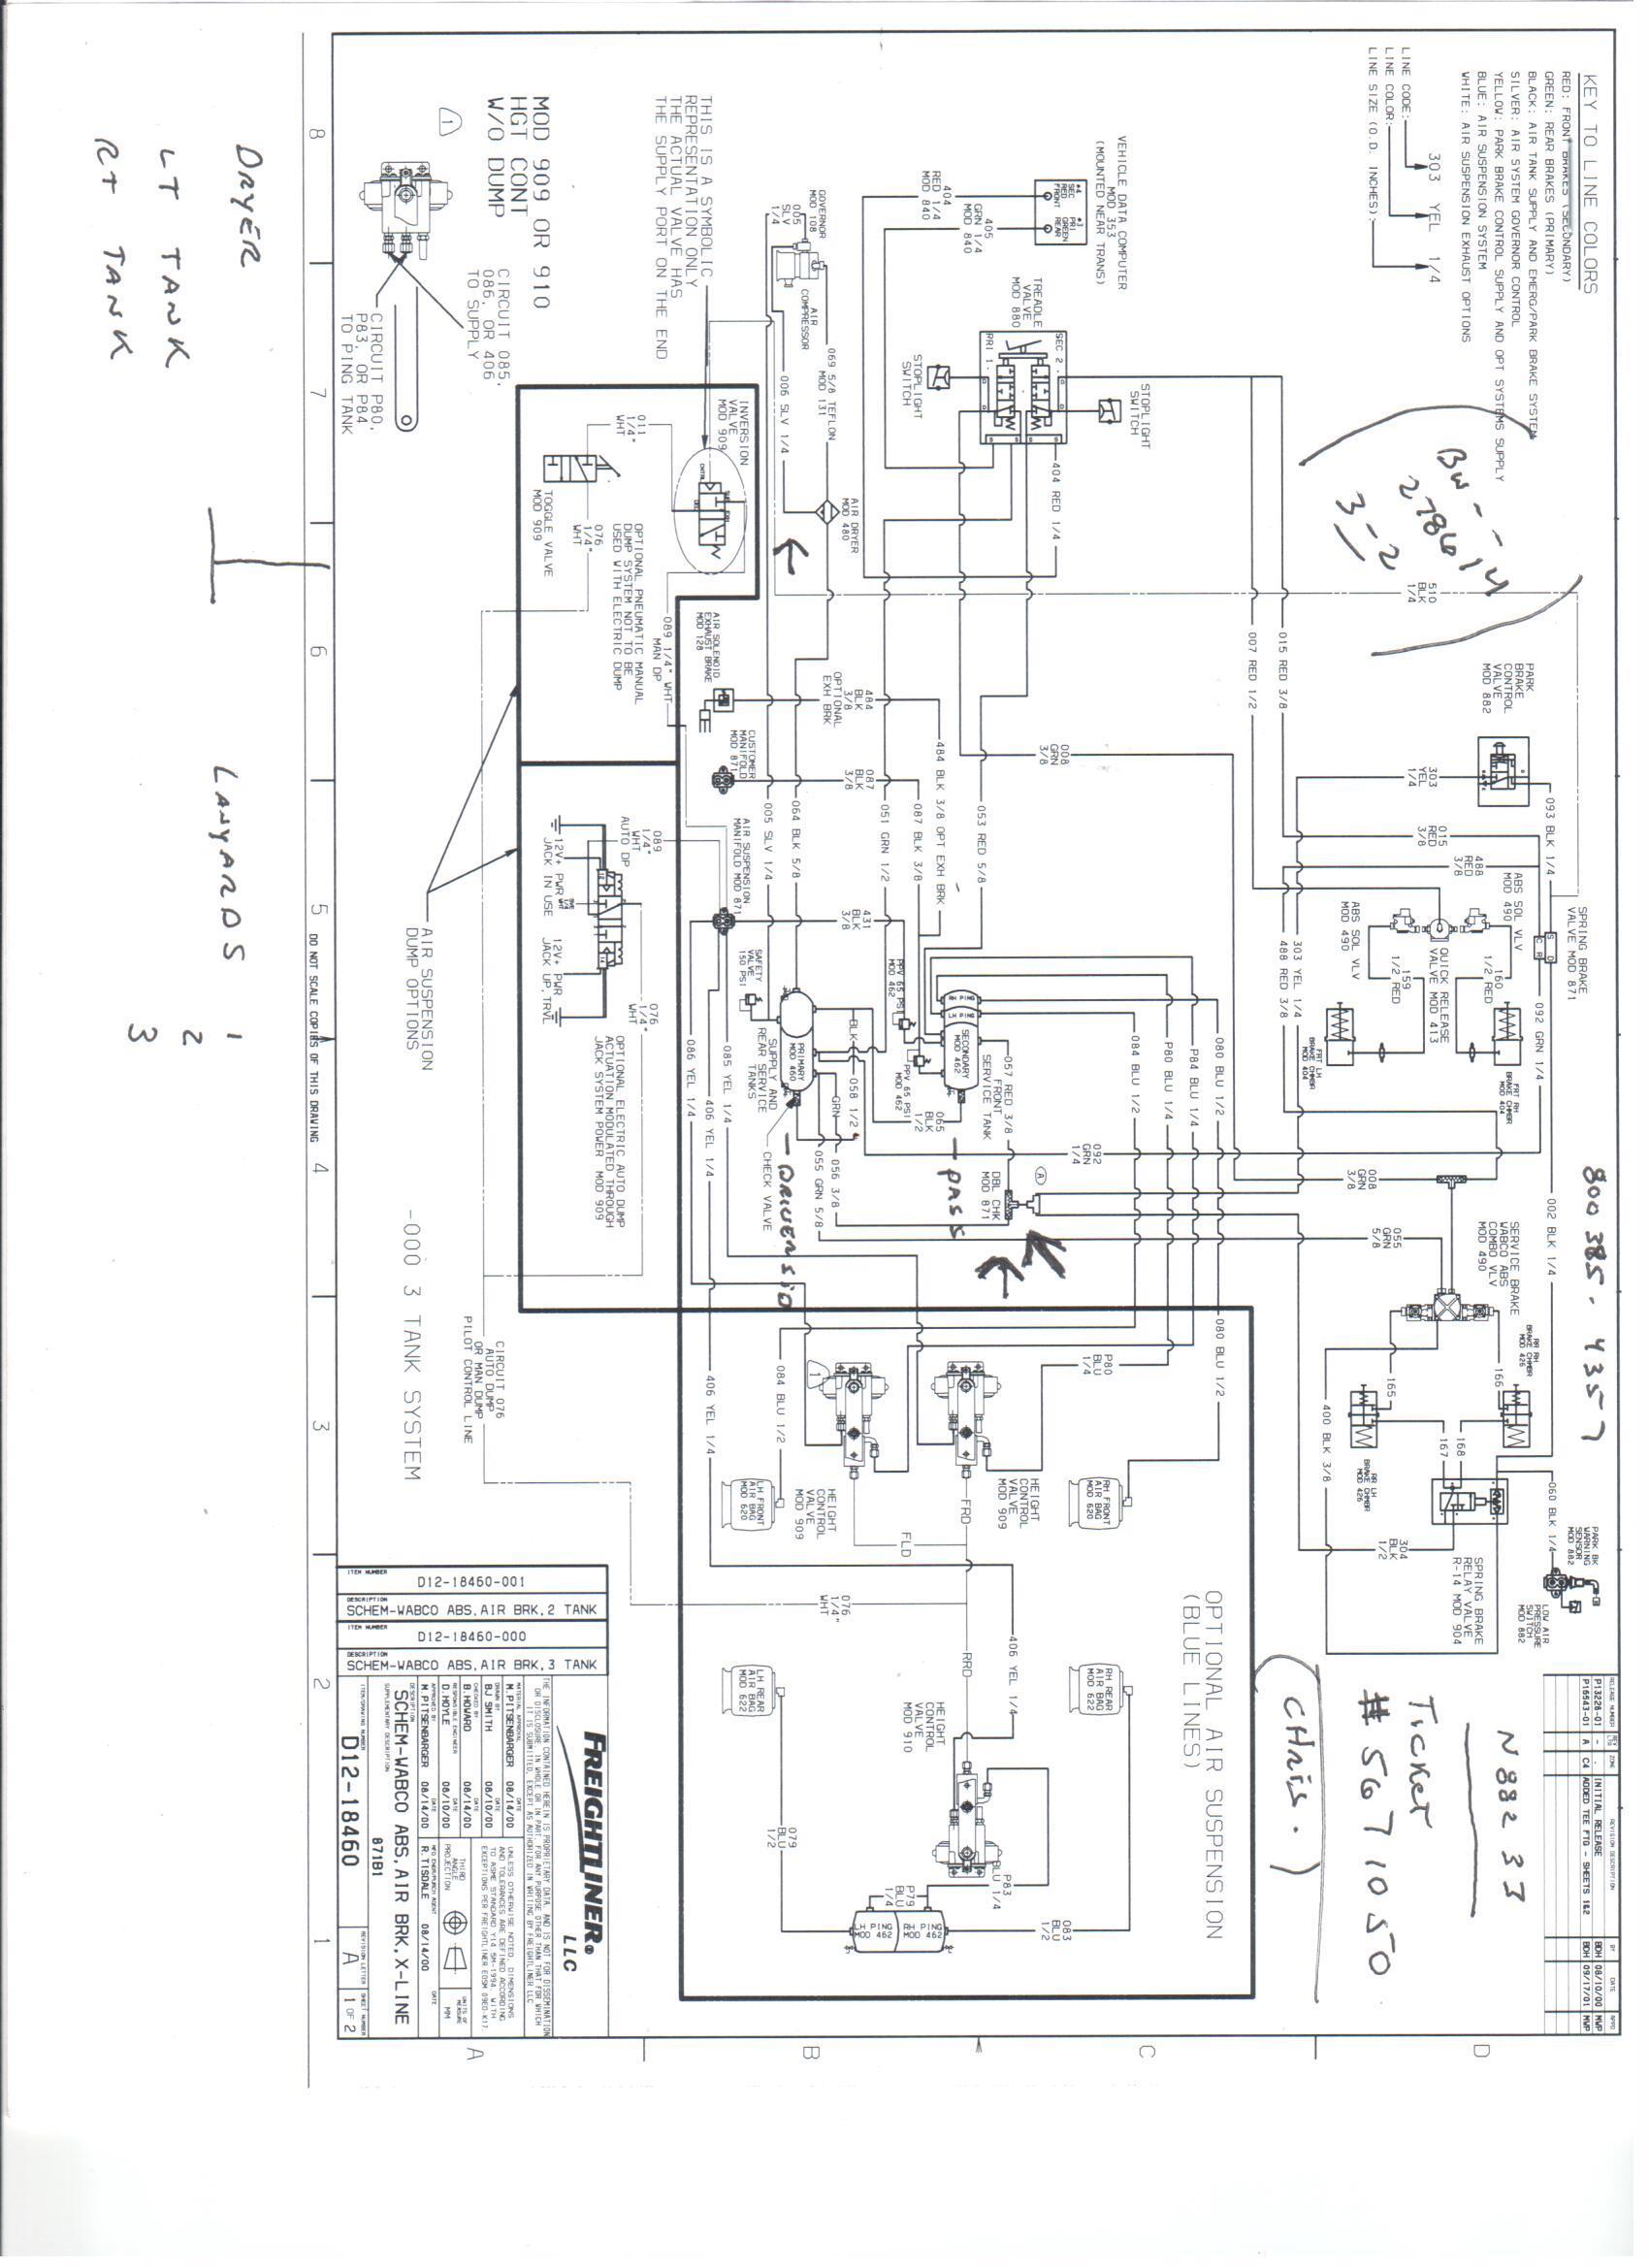 AY_4038] Rv Freightliner Xc Chassis Diagram On Freightliner M2 Wiring  Diagrams Wiring DiagramArcin Phot Sapebe Mohammedshrine Librar Wiring 101